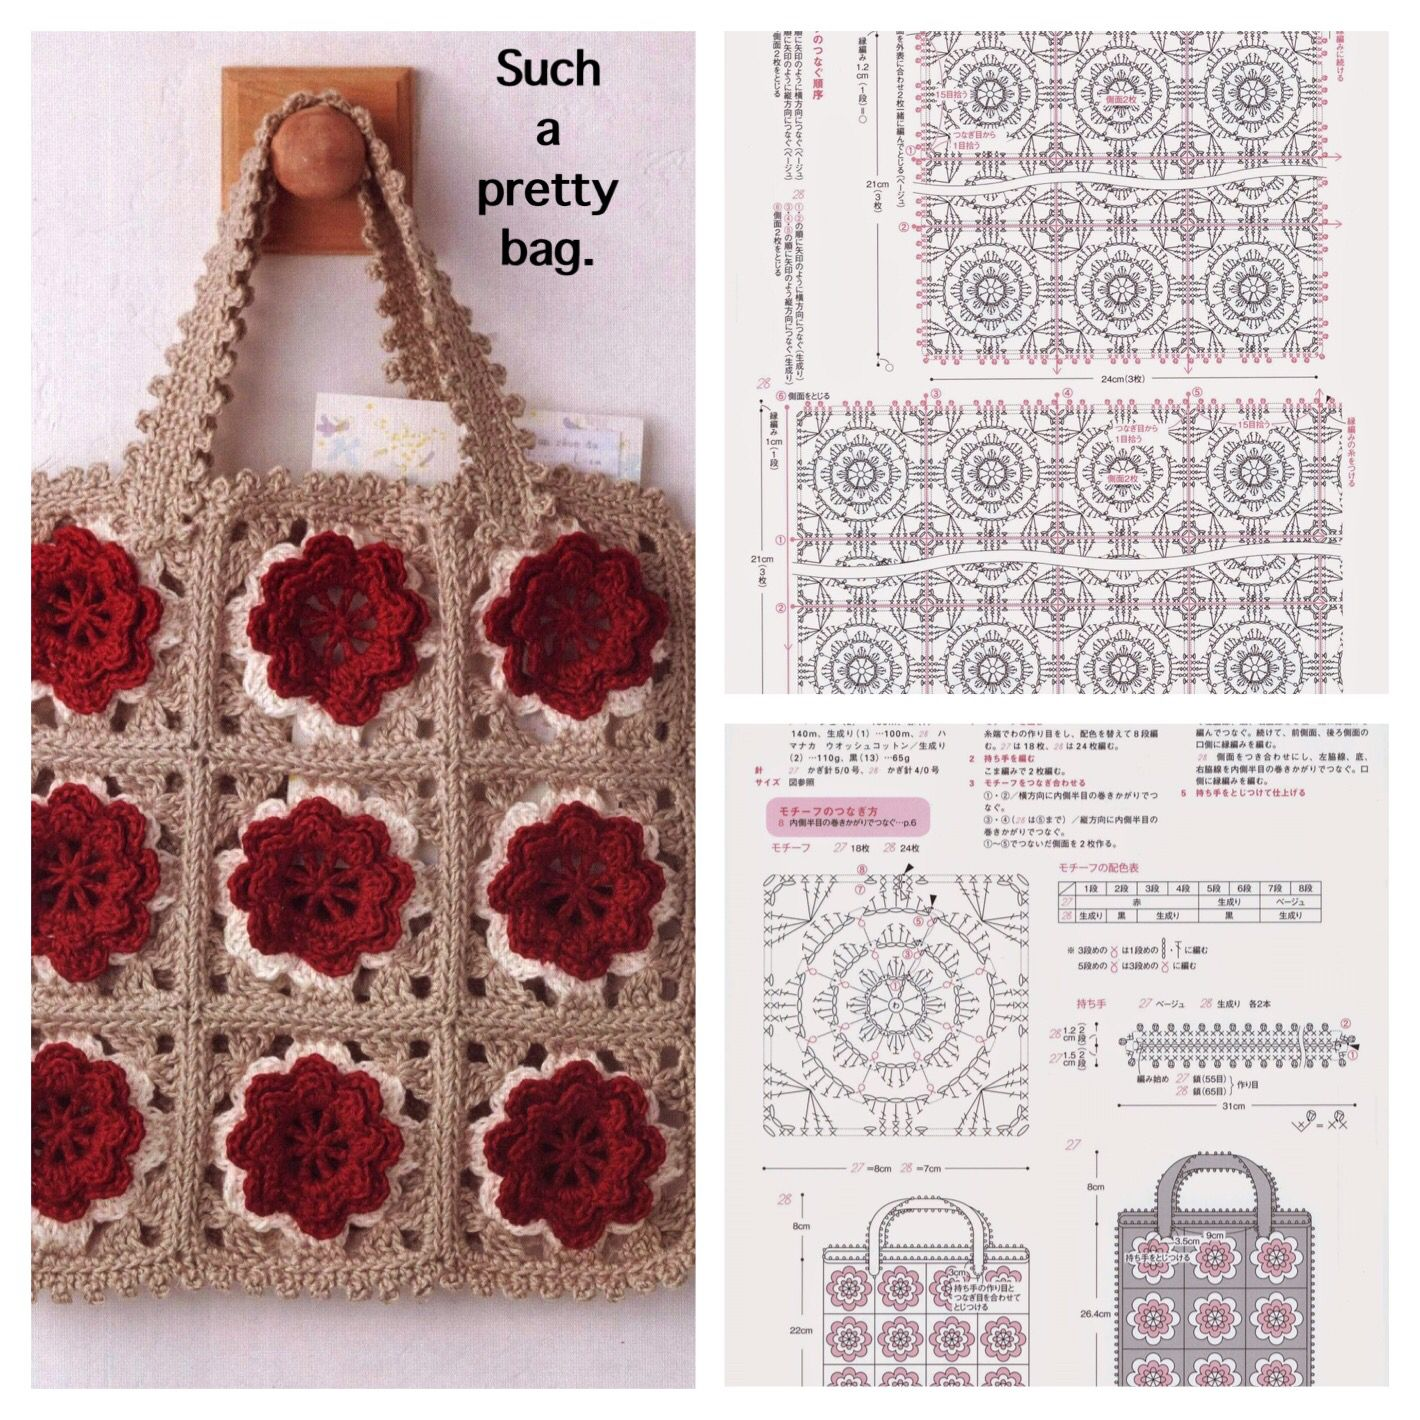 A pretty crochet bag.